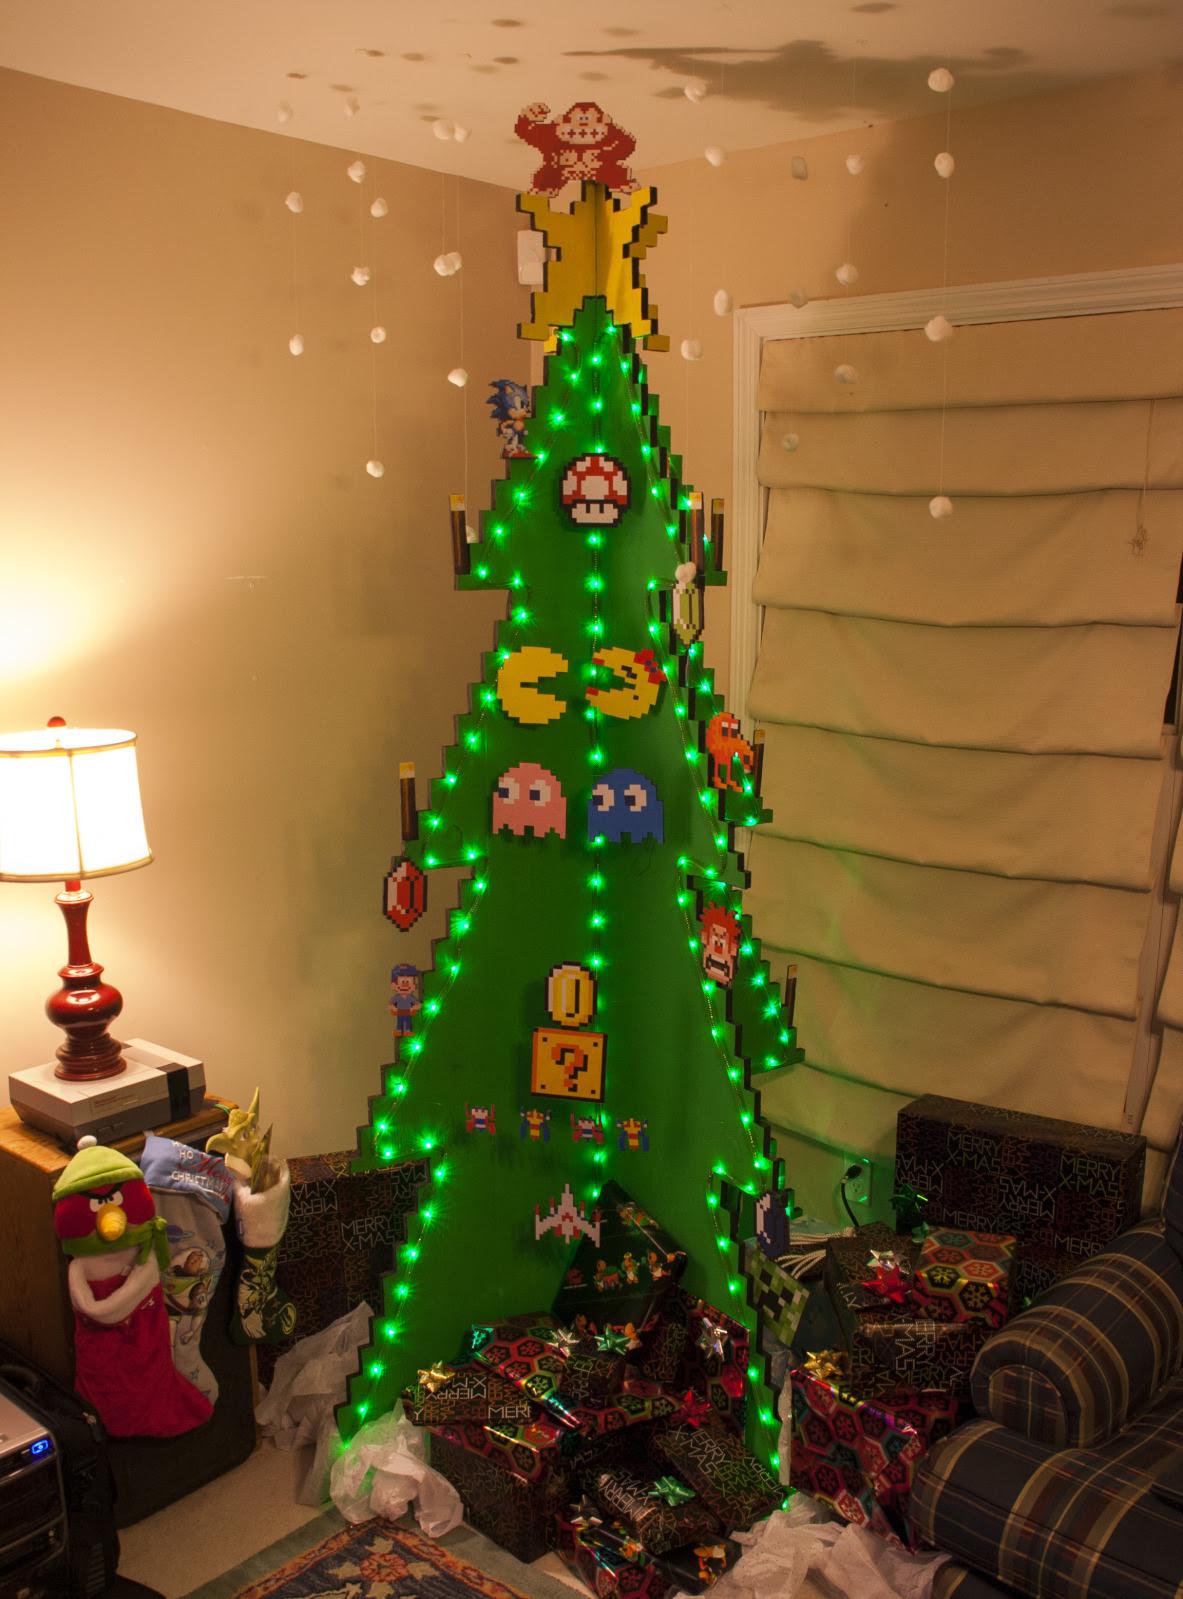 8-Bit Christmas Tree